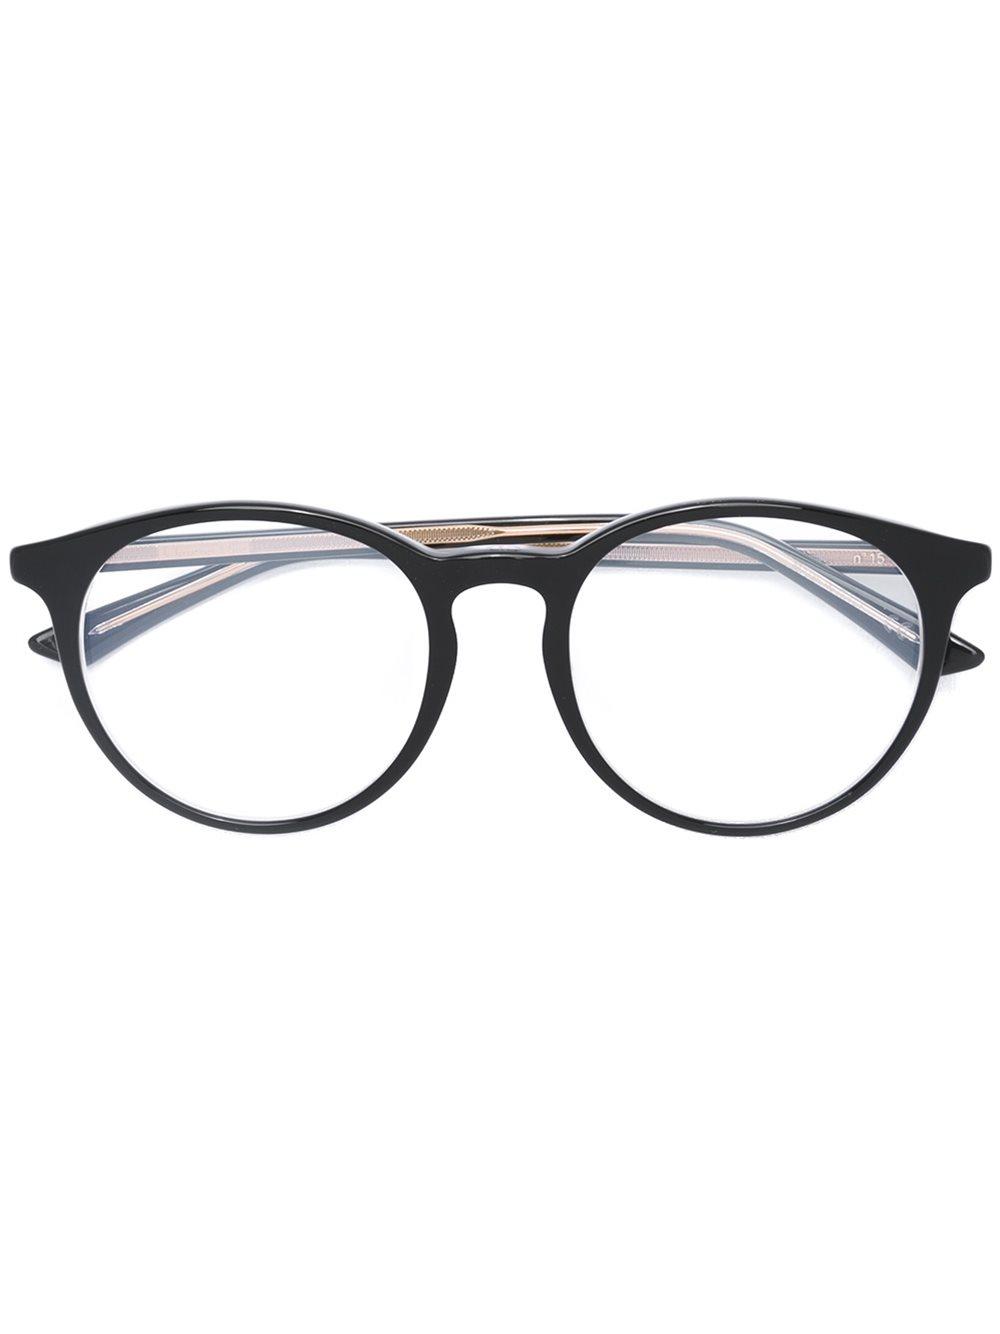 Dior Round Frame Glasses in Black Lyst